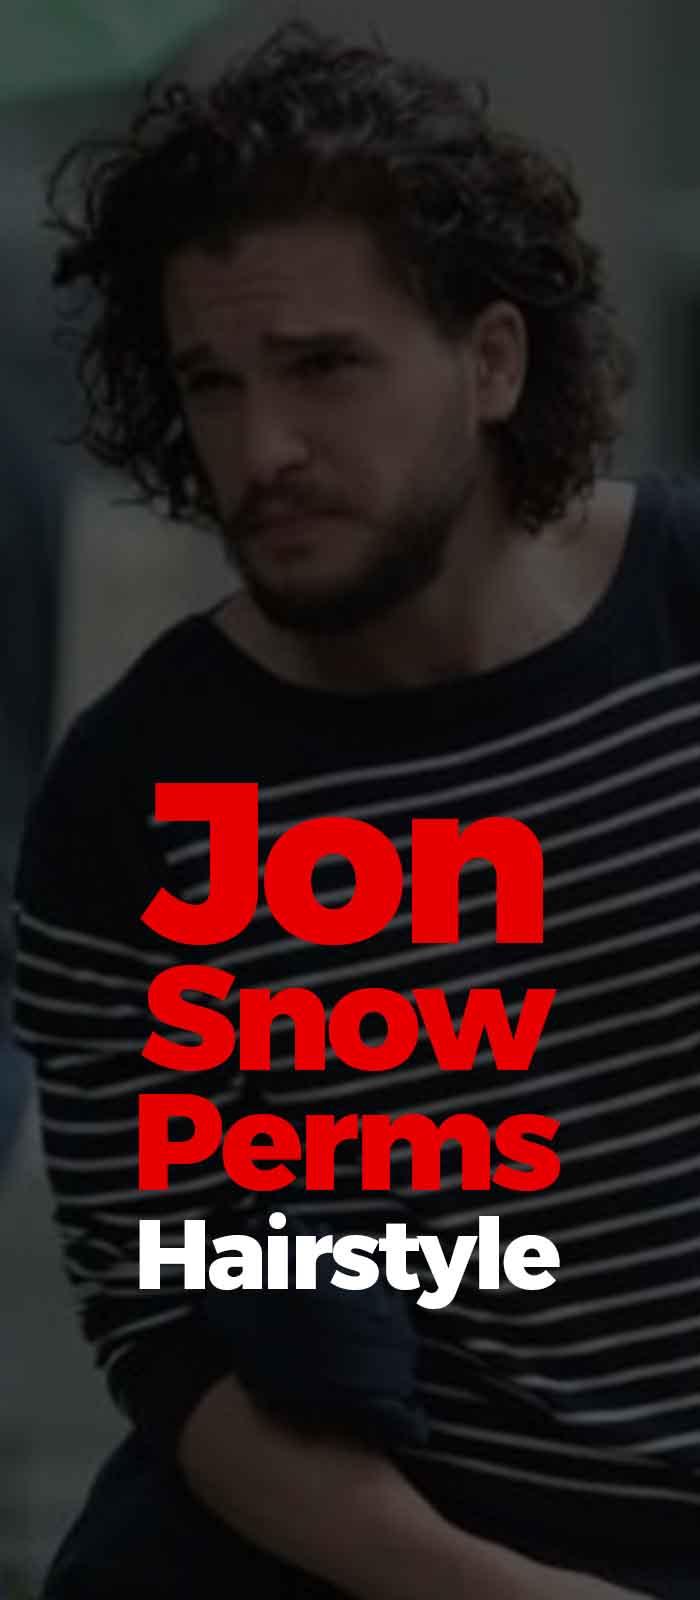 Jon Snow Perms Hairstyles!